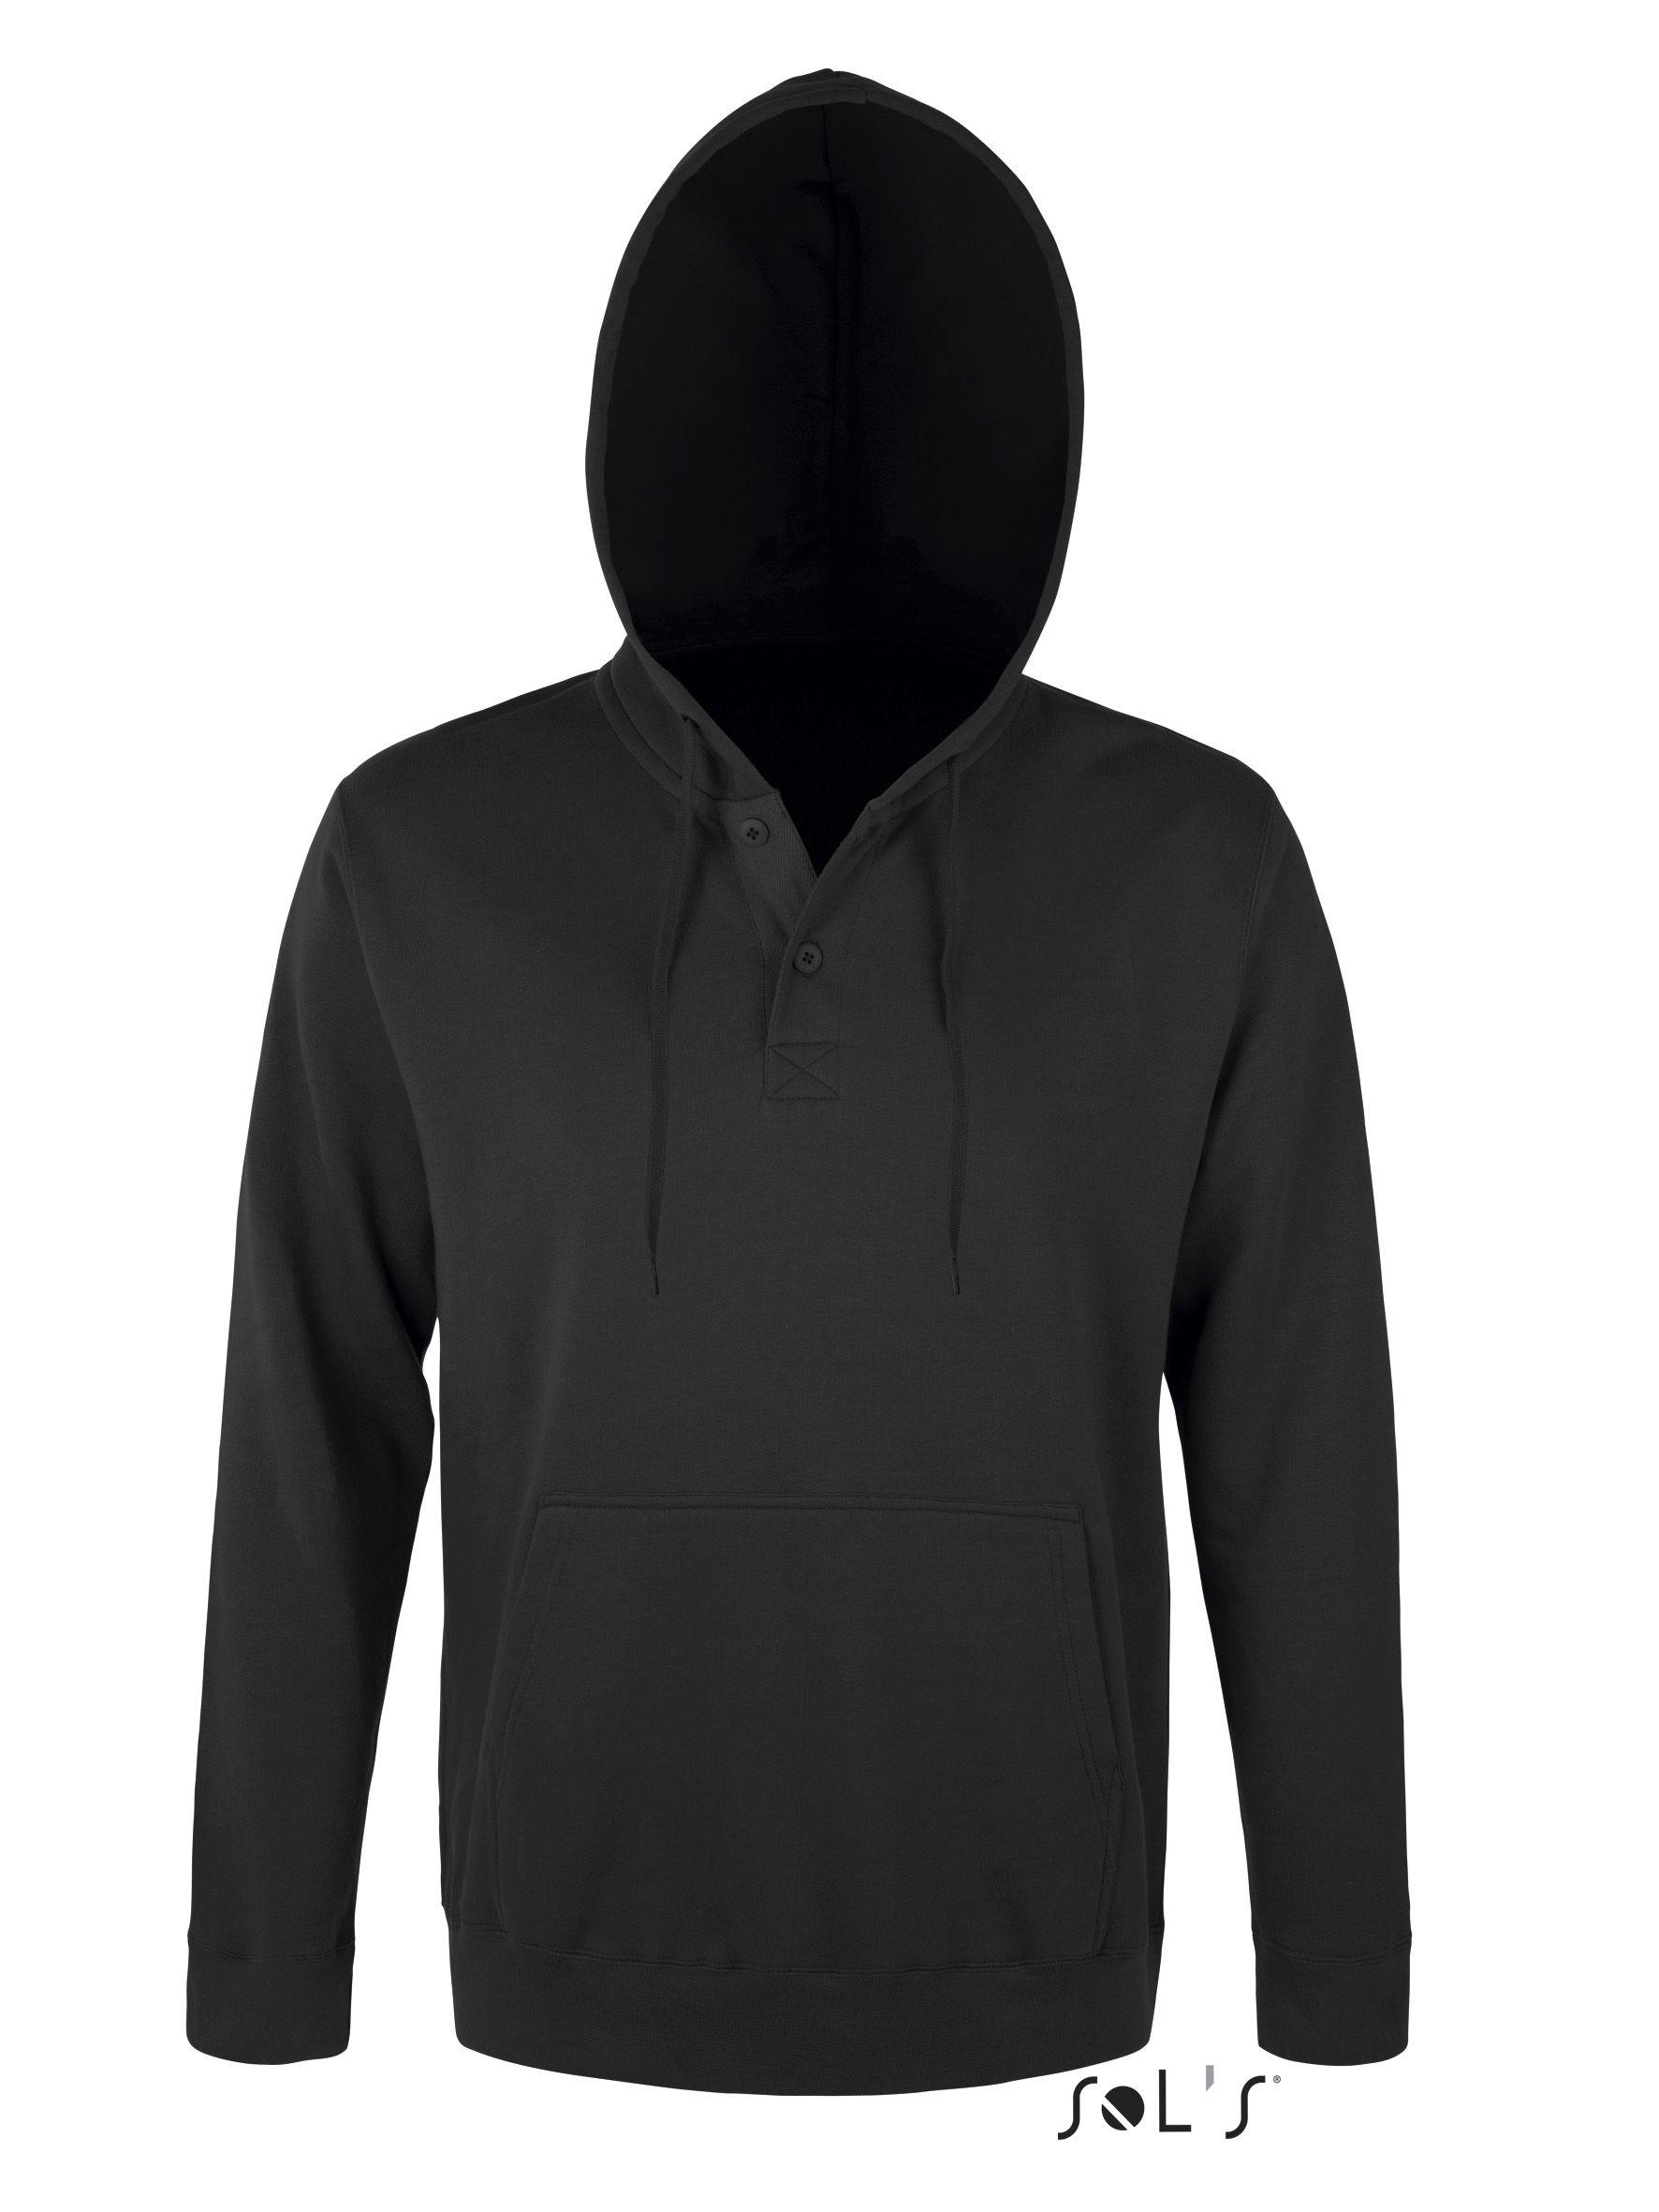 Bluza dresowa S 47301 Saturn 320 - 47301_black_S - Kolor: Black